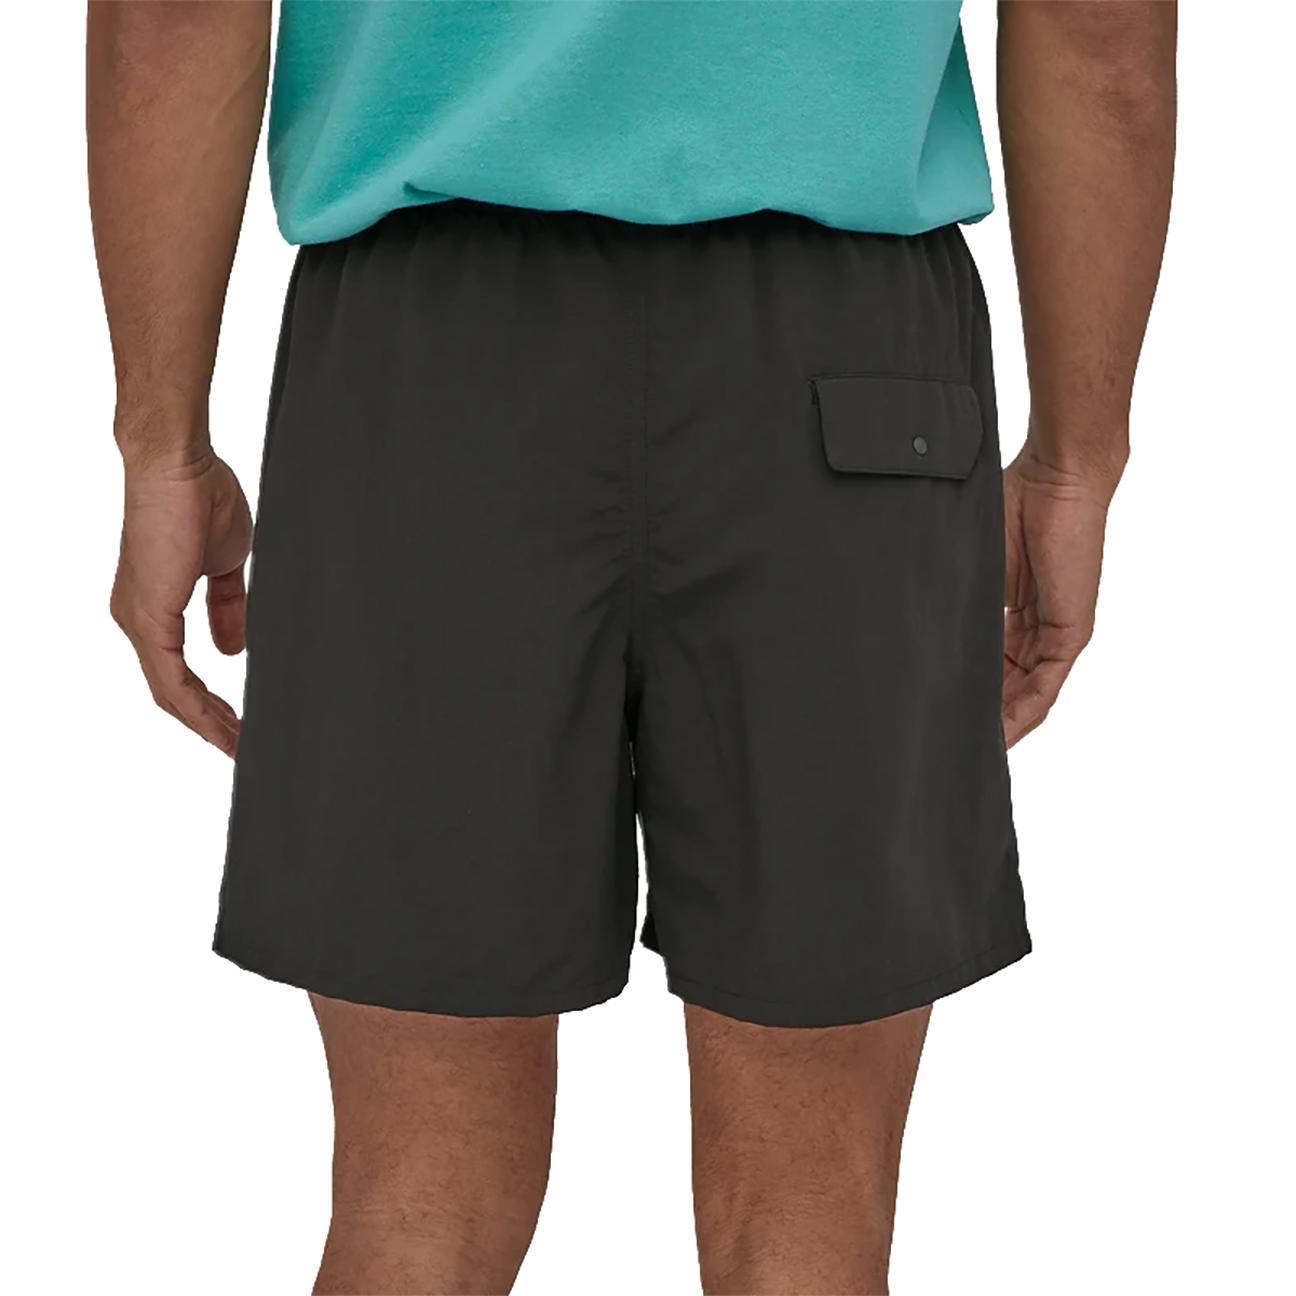 "Men's Baggies Shorts - 5"", Black-3"